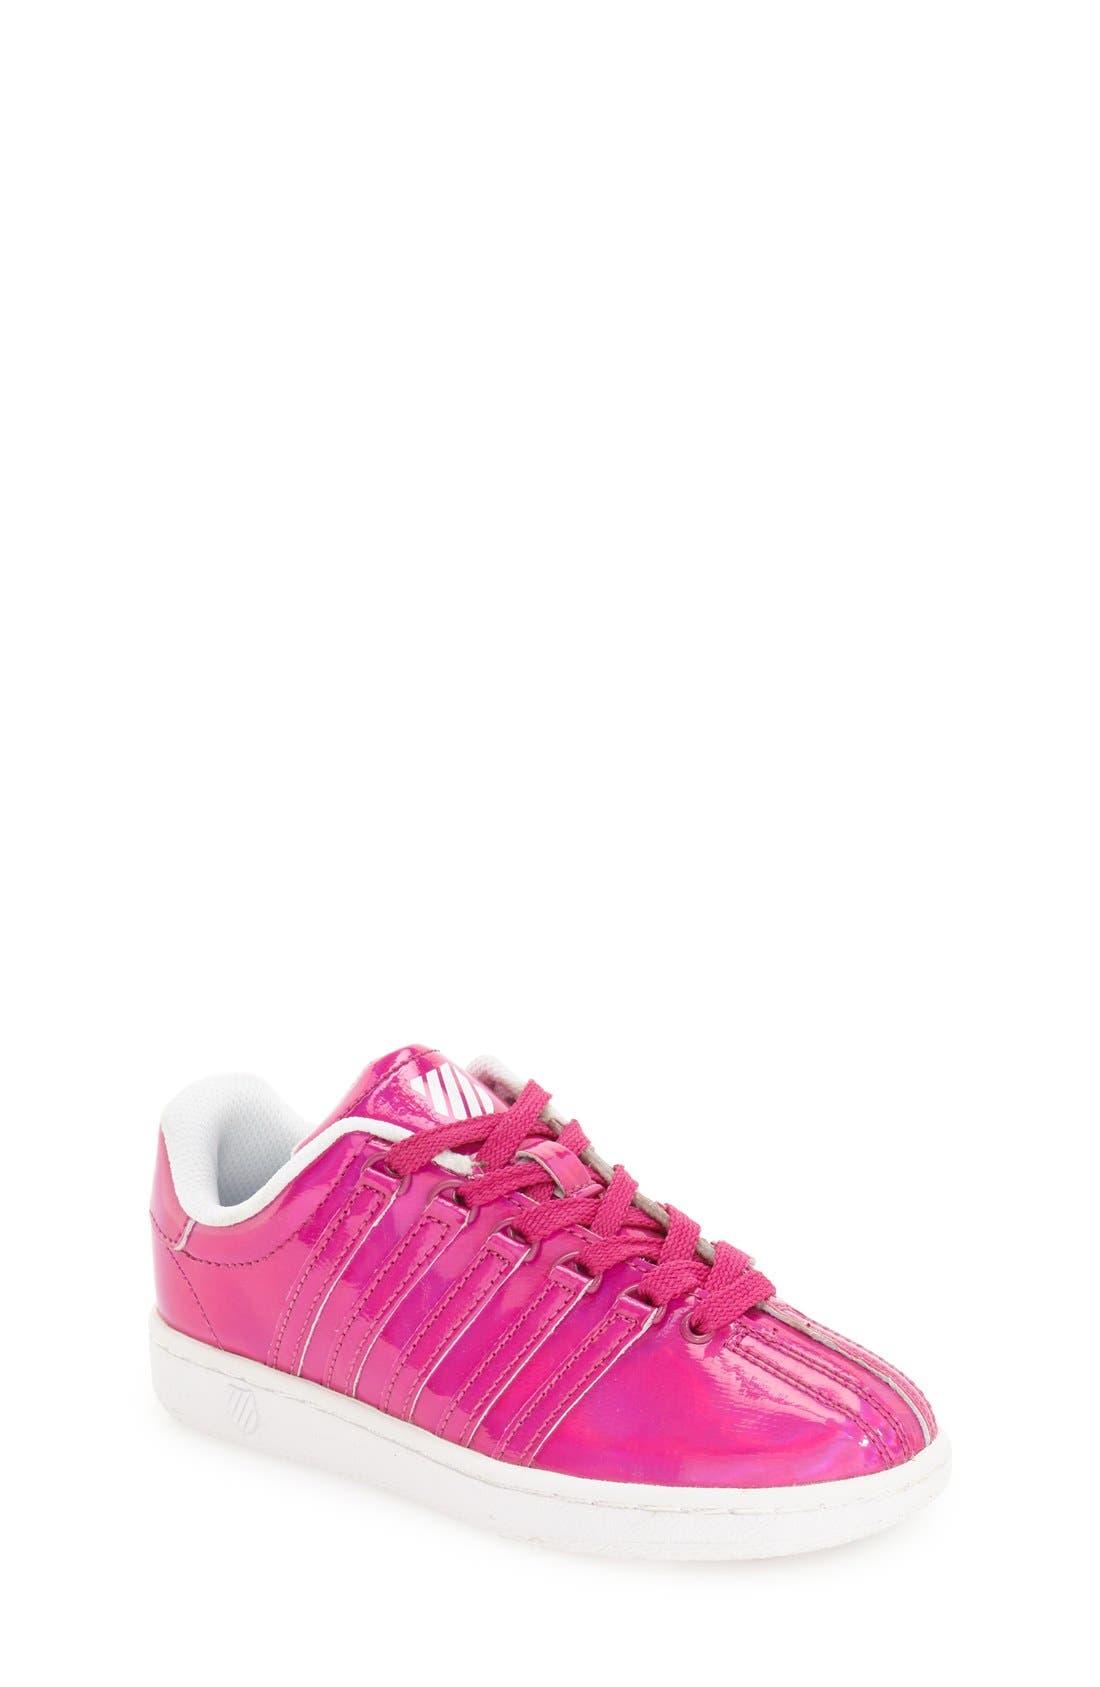 Main Image - K-Swiss 'Classic - Shine On' Sneaker (Toddler & Little Kid)